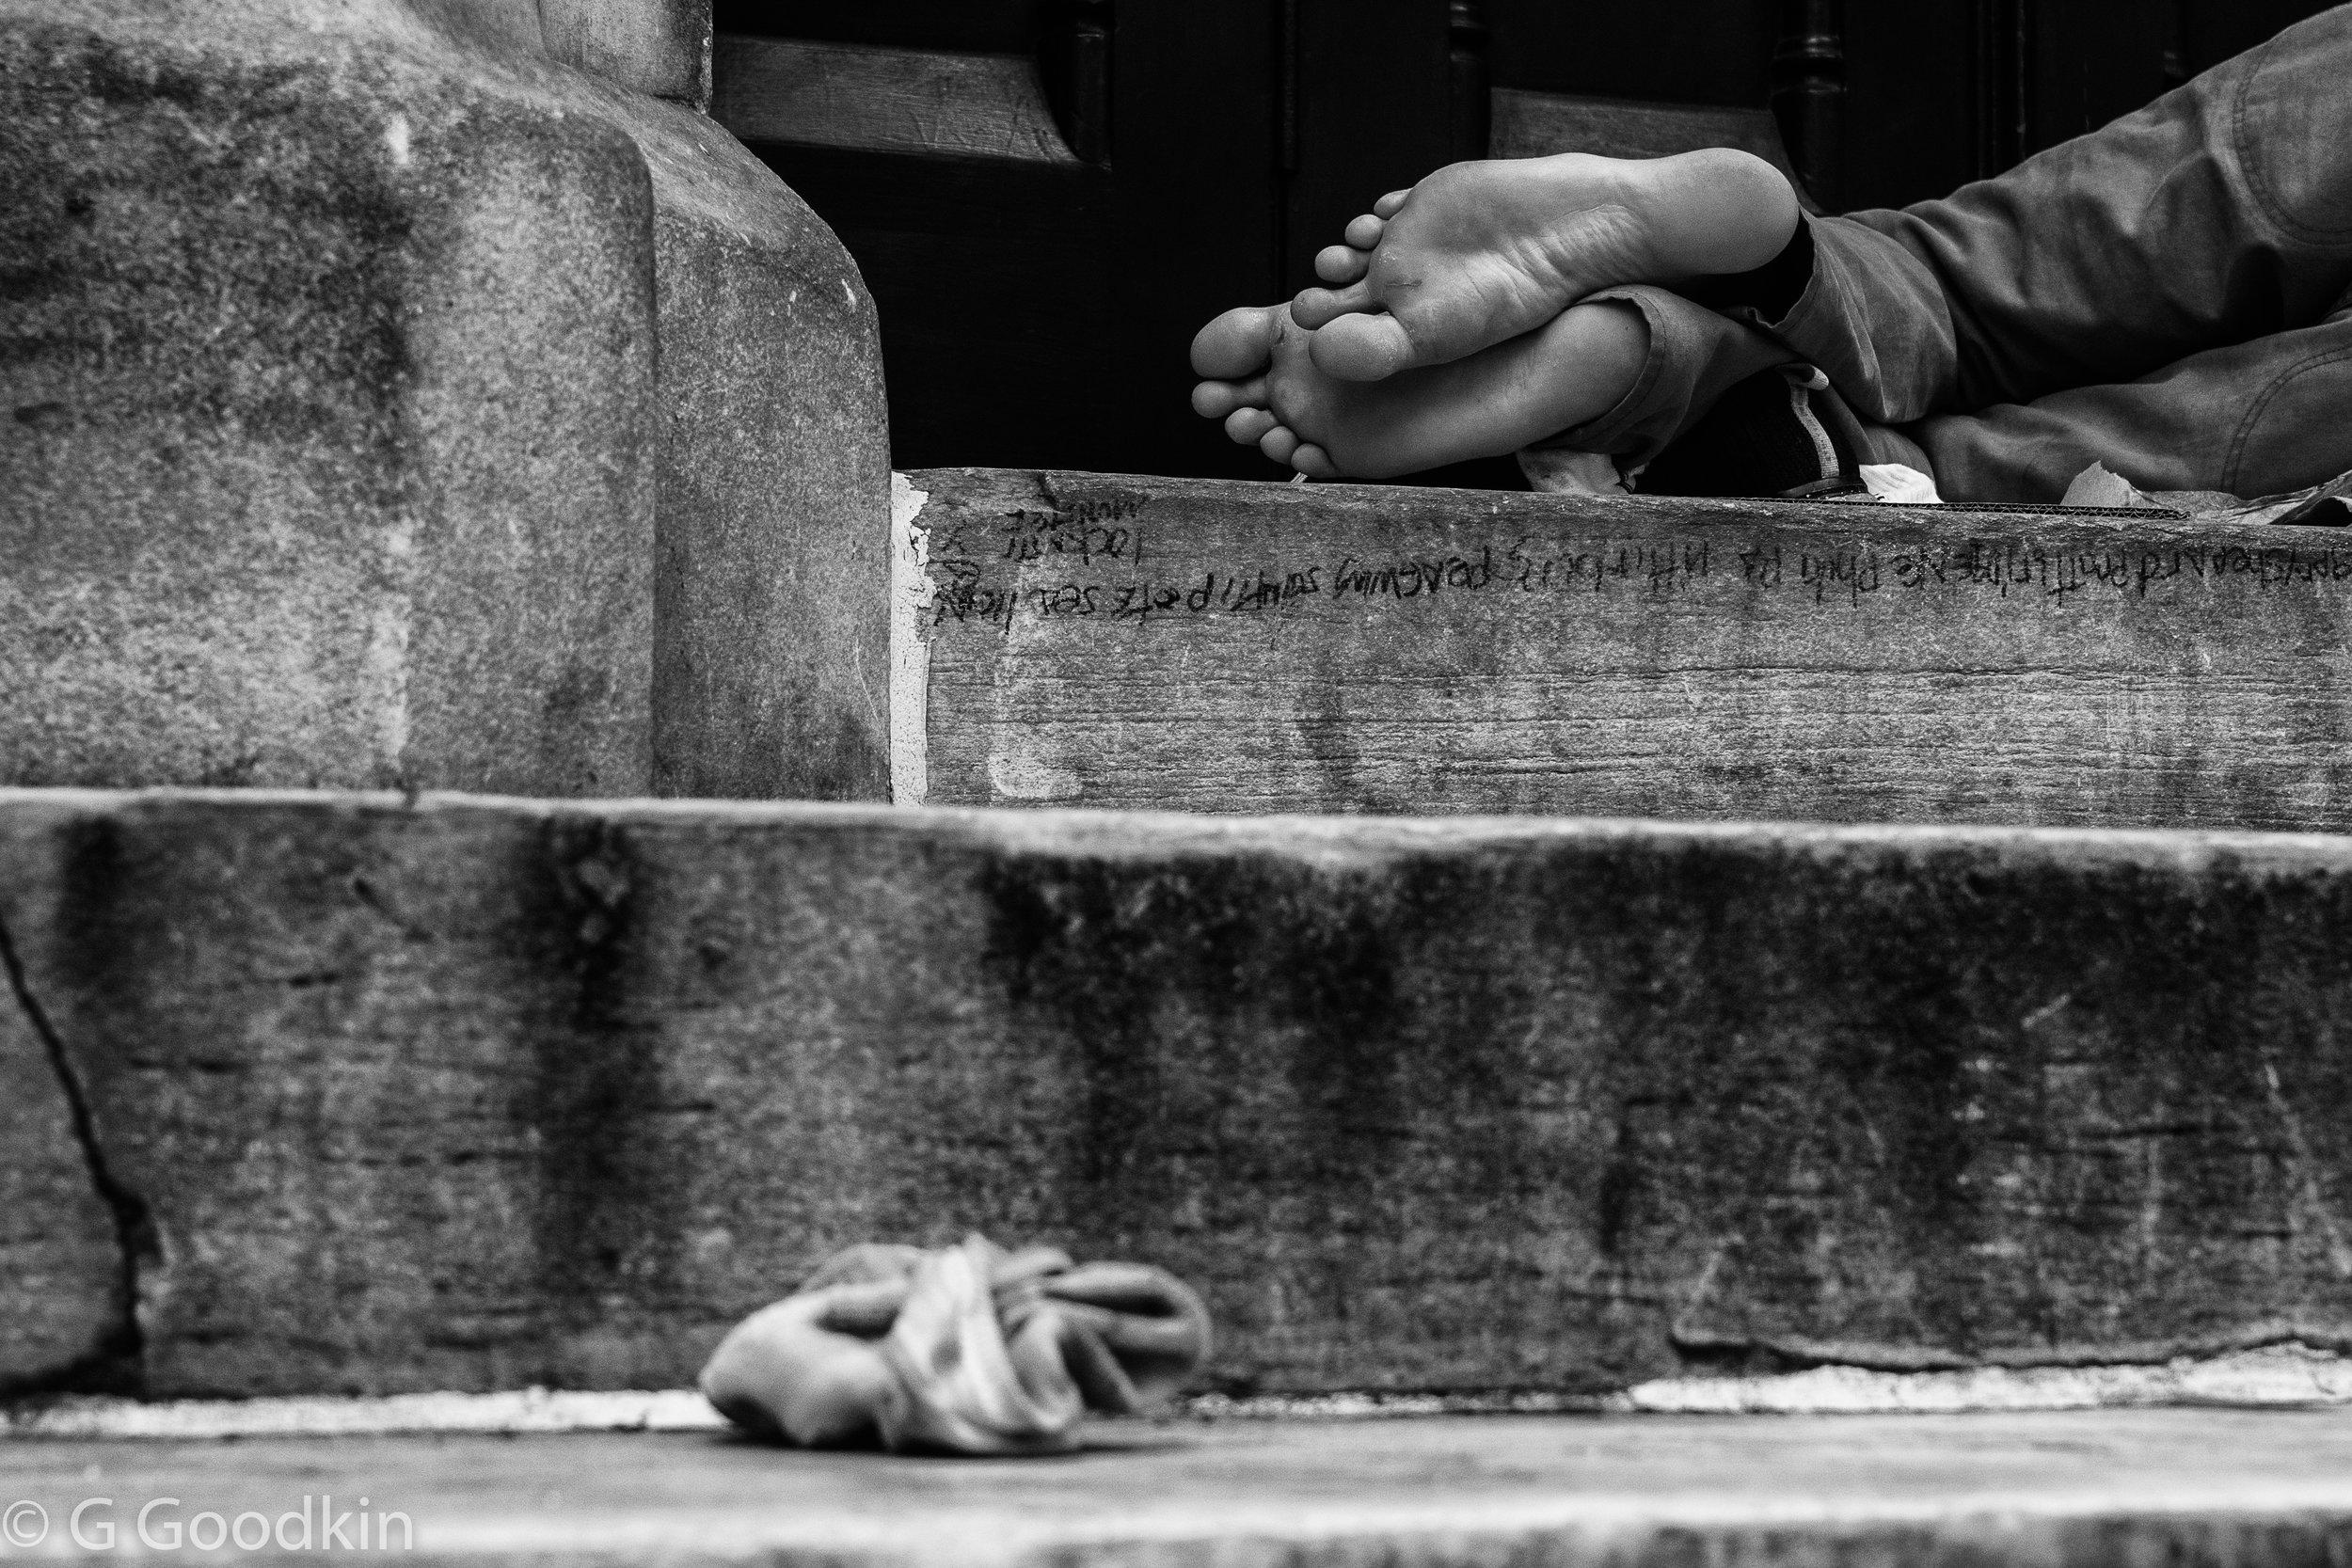 20171013_philadelphia_street-46bnw.jpg